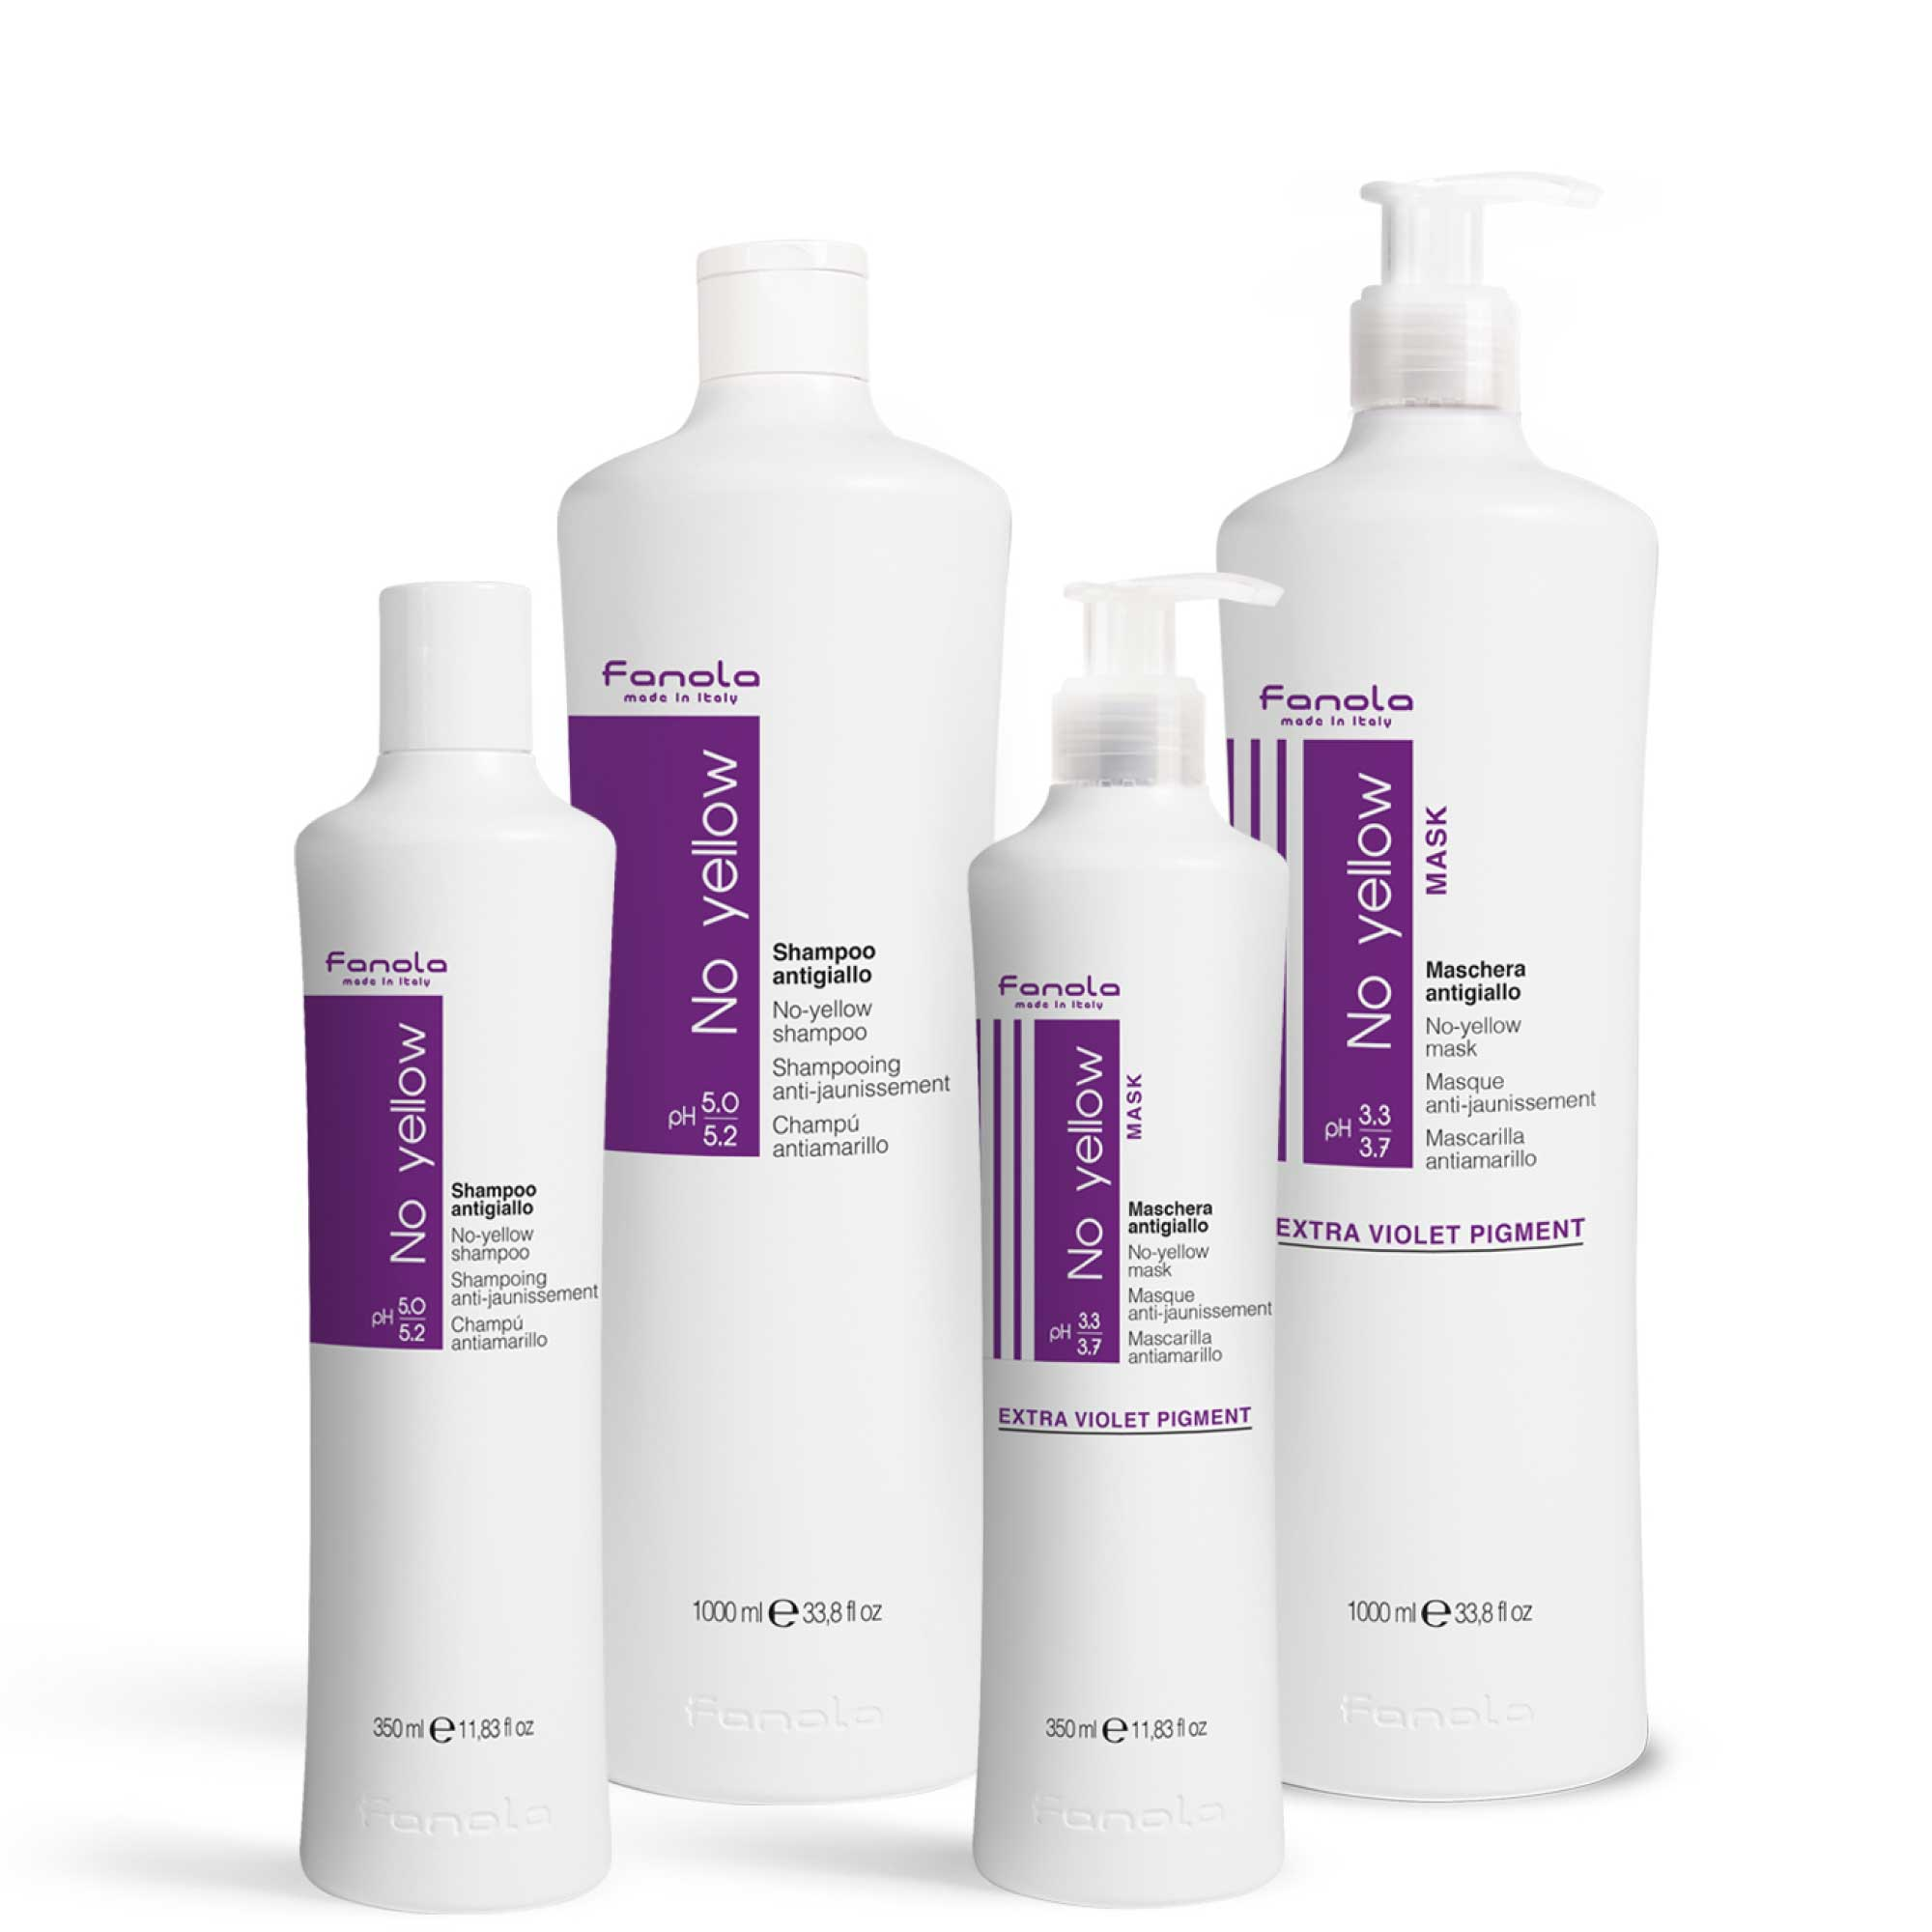 Fanola No Yellow Hair Toner - Streak Shampoo Or Mask Or Pack Options Available